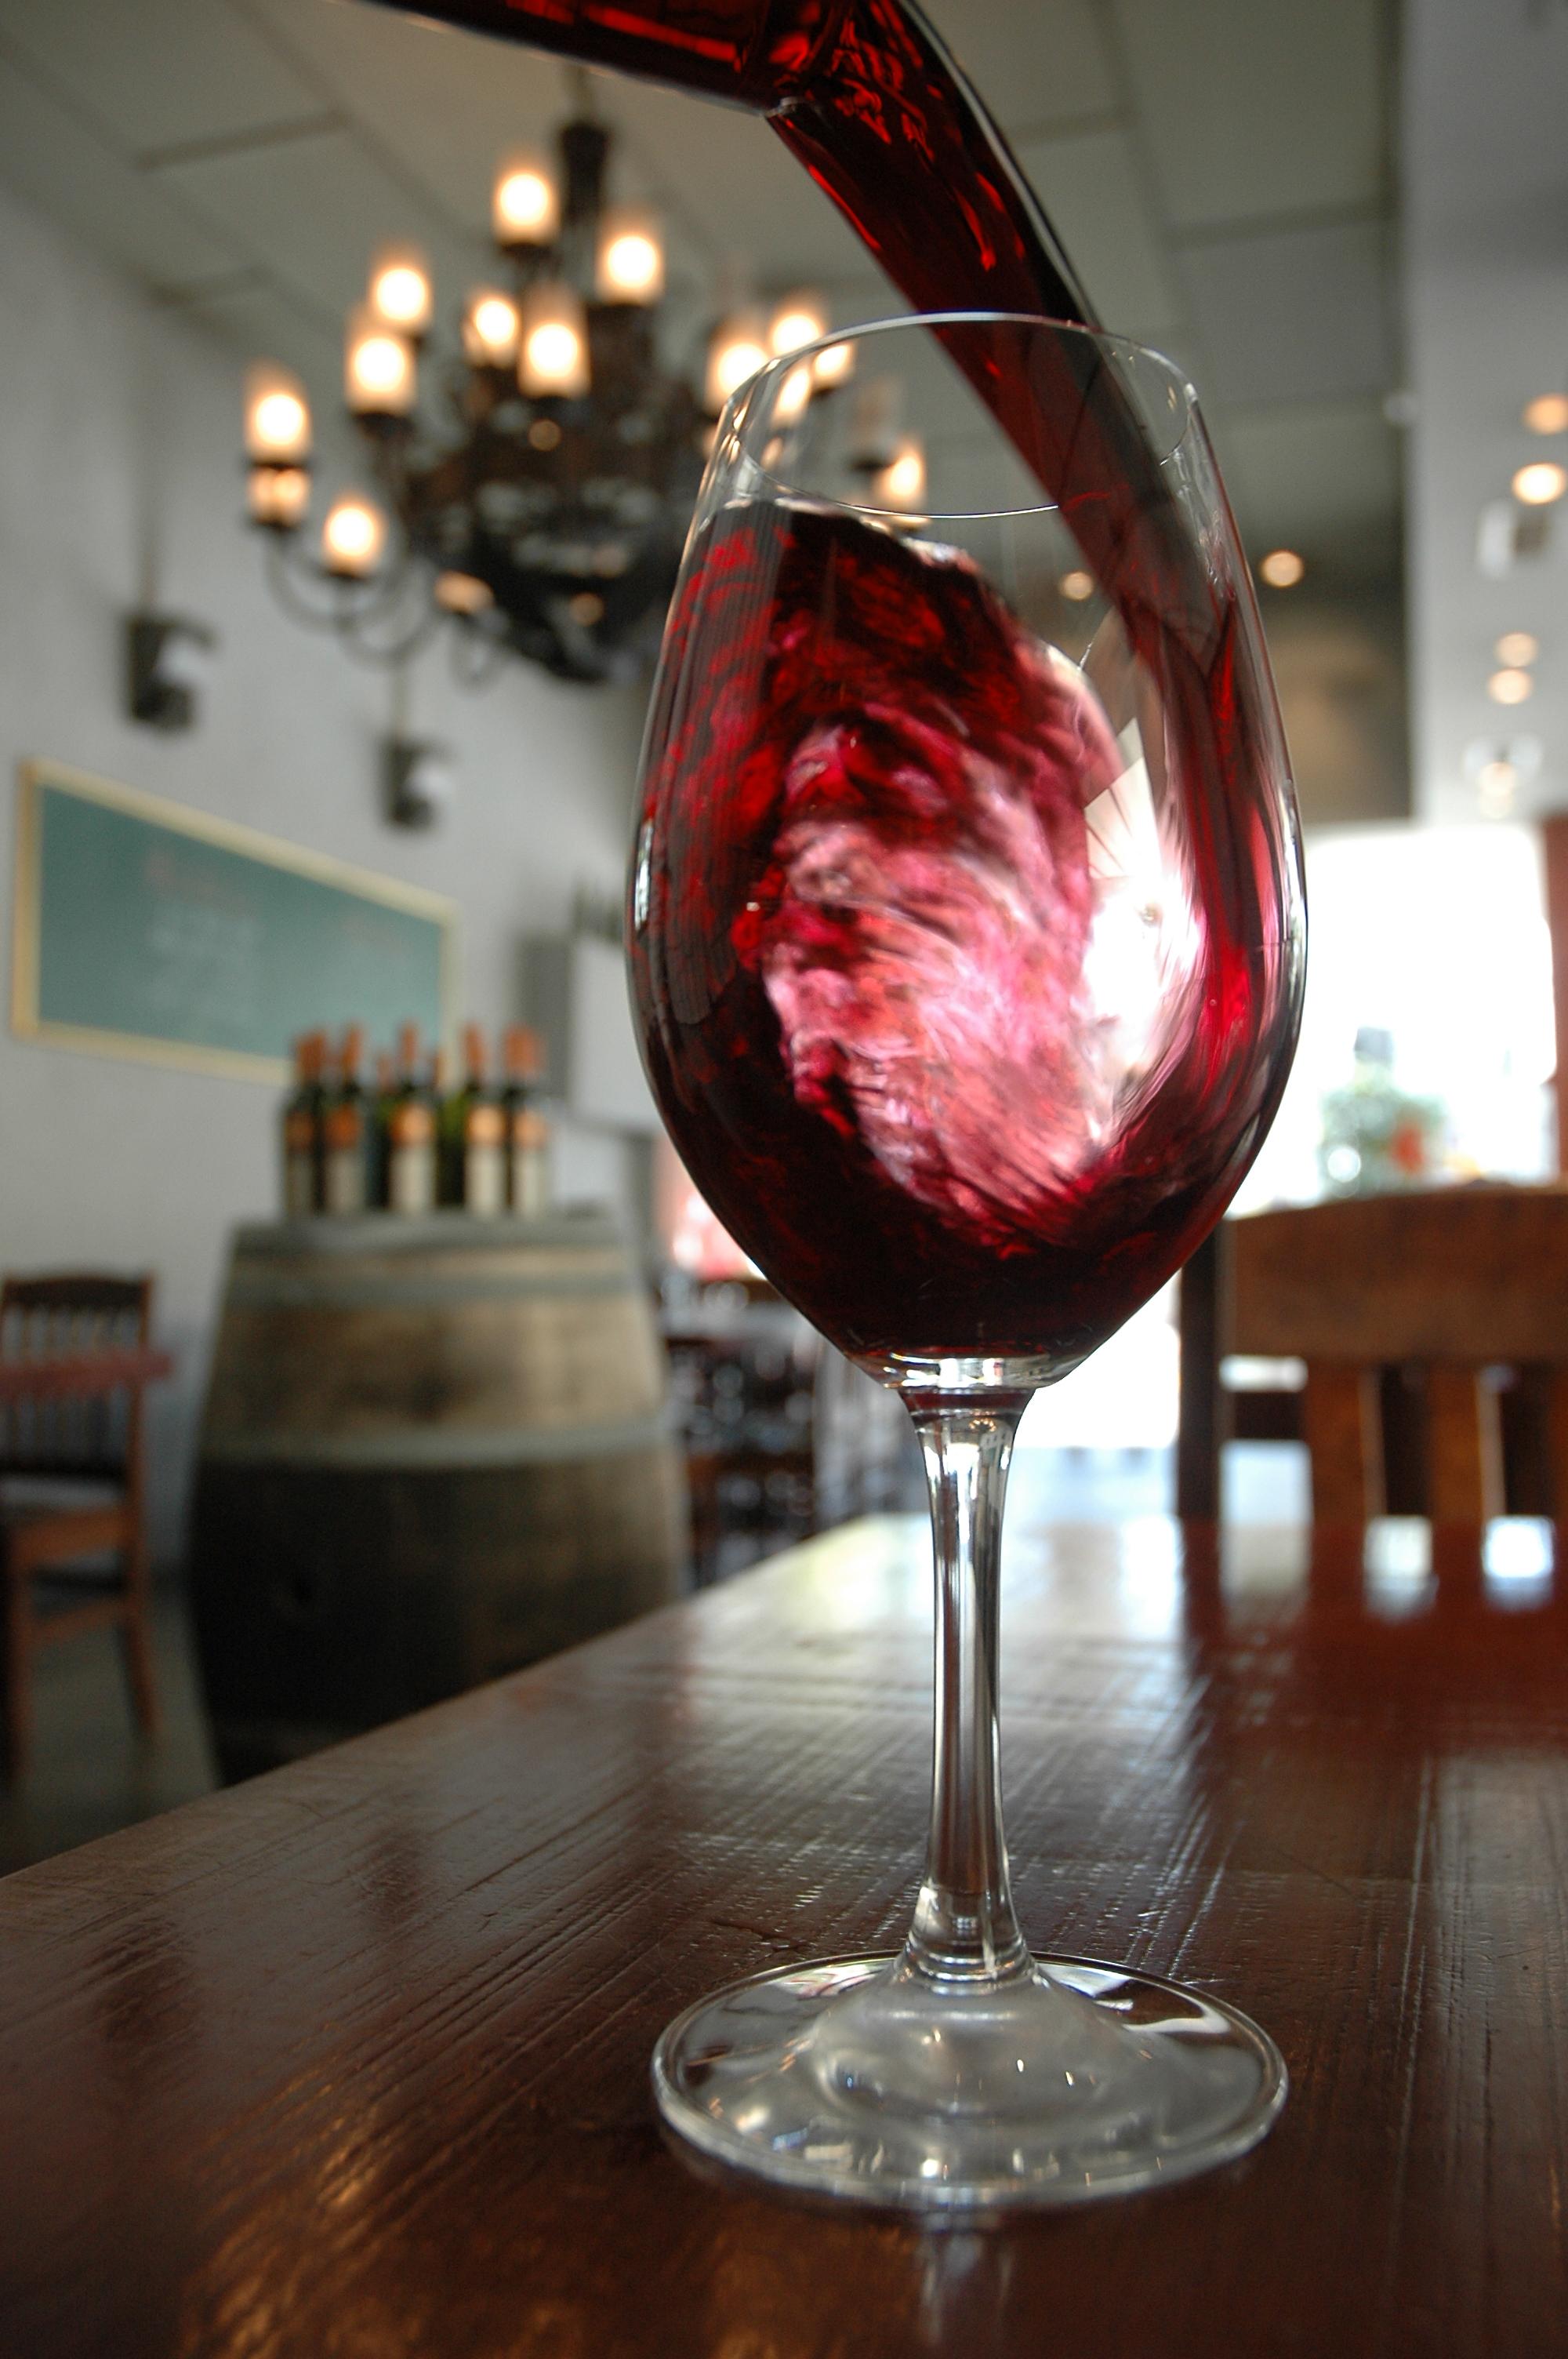 glass of wine.JPG